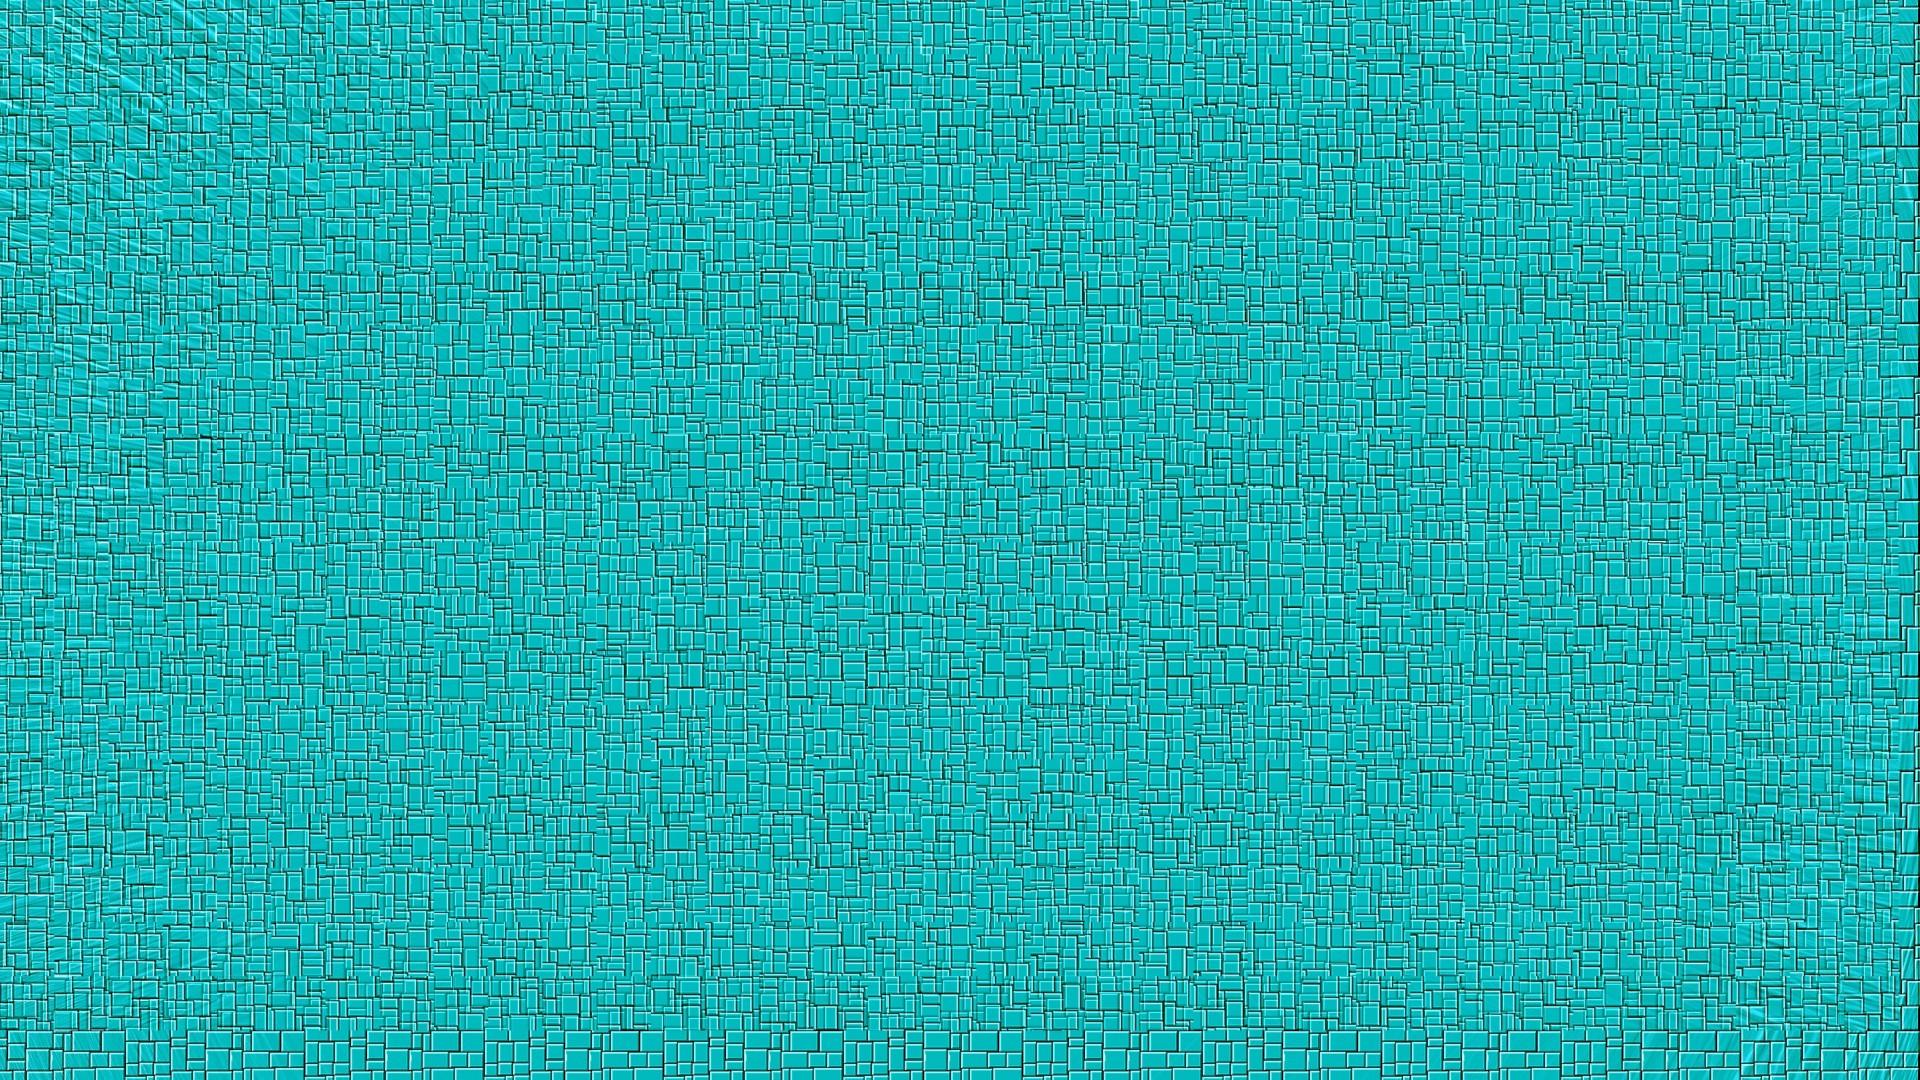 Superman Hd Wallpaper Turquoise Mosaic Background Pattern Free Stock Photo